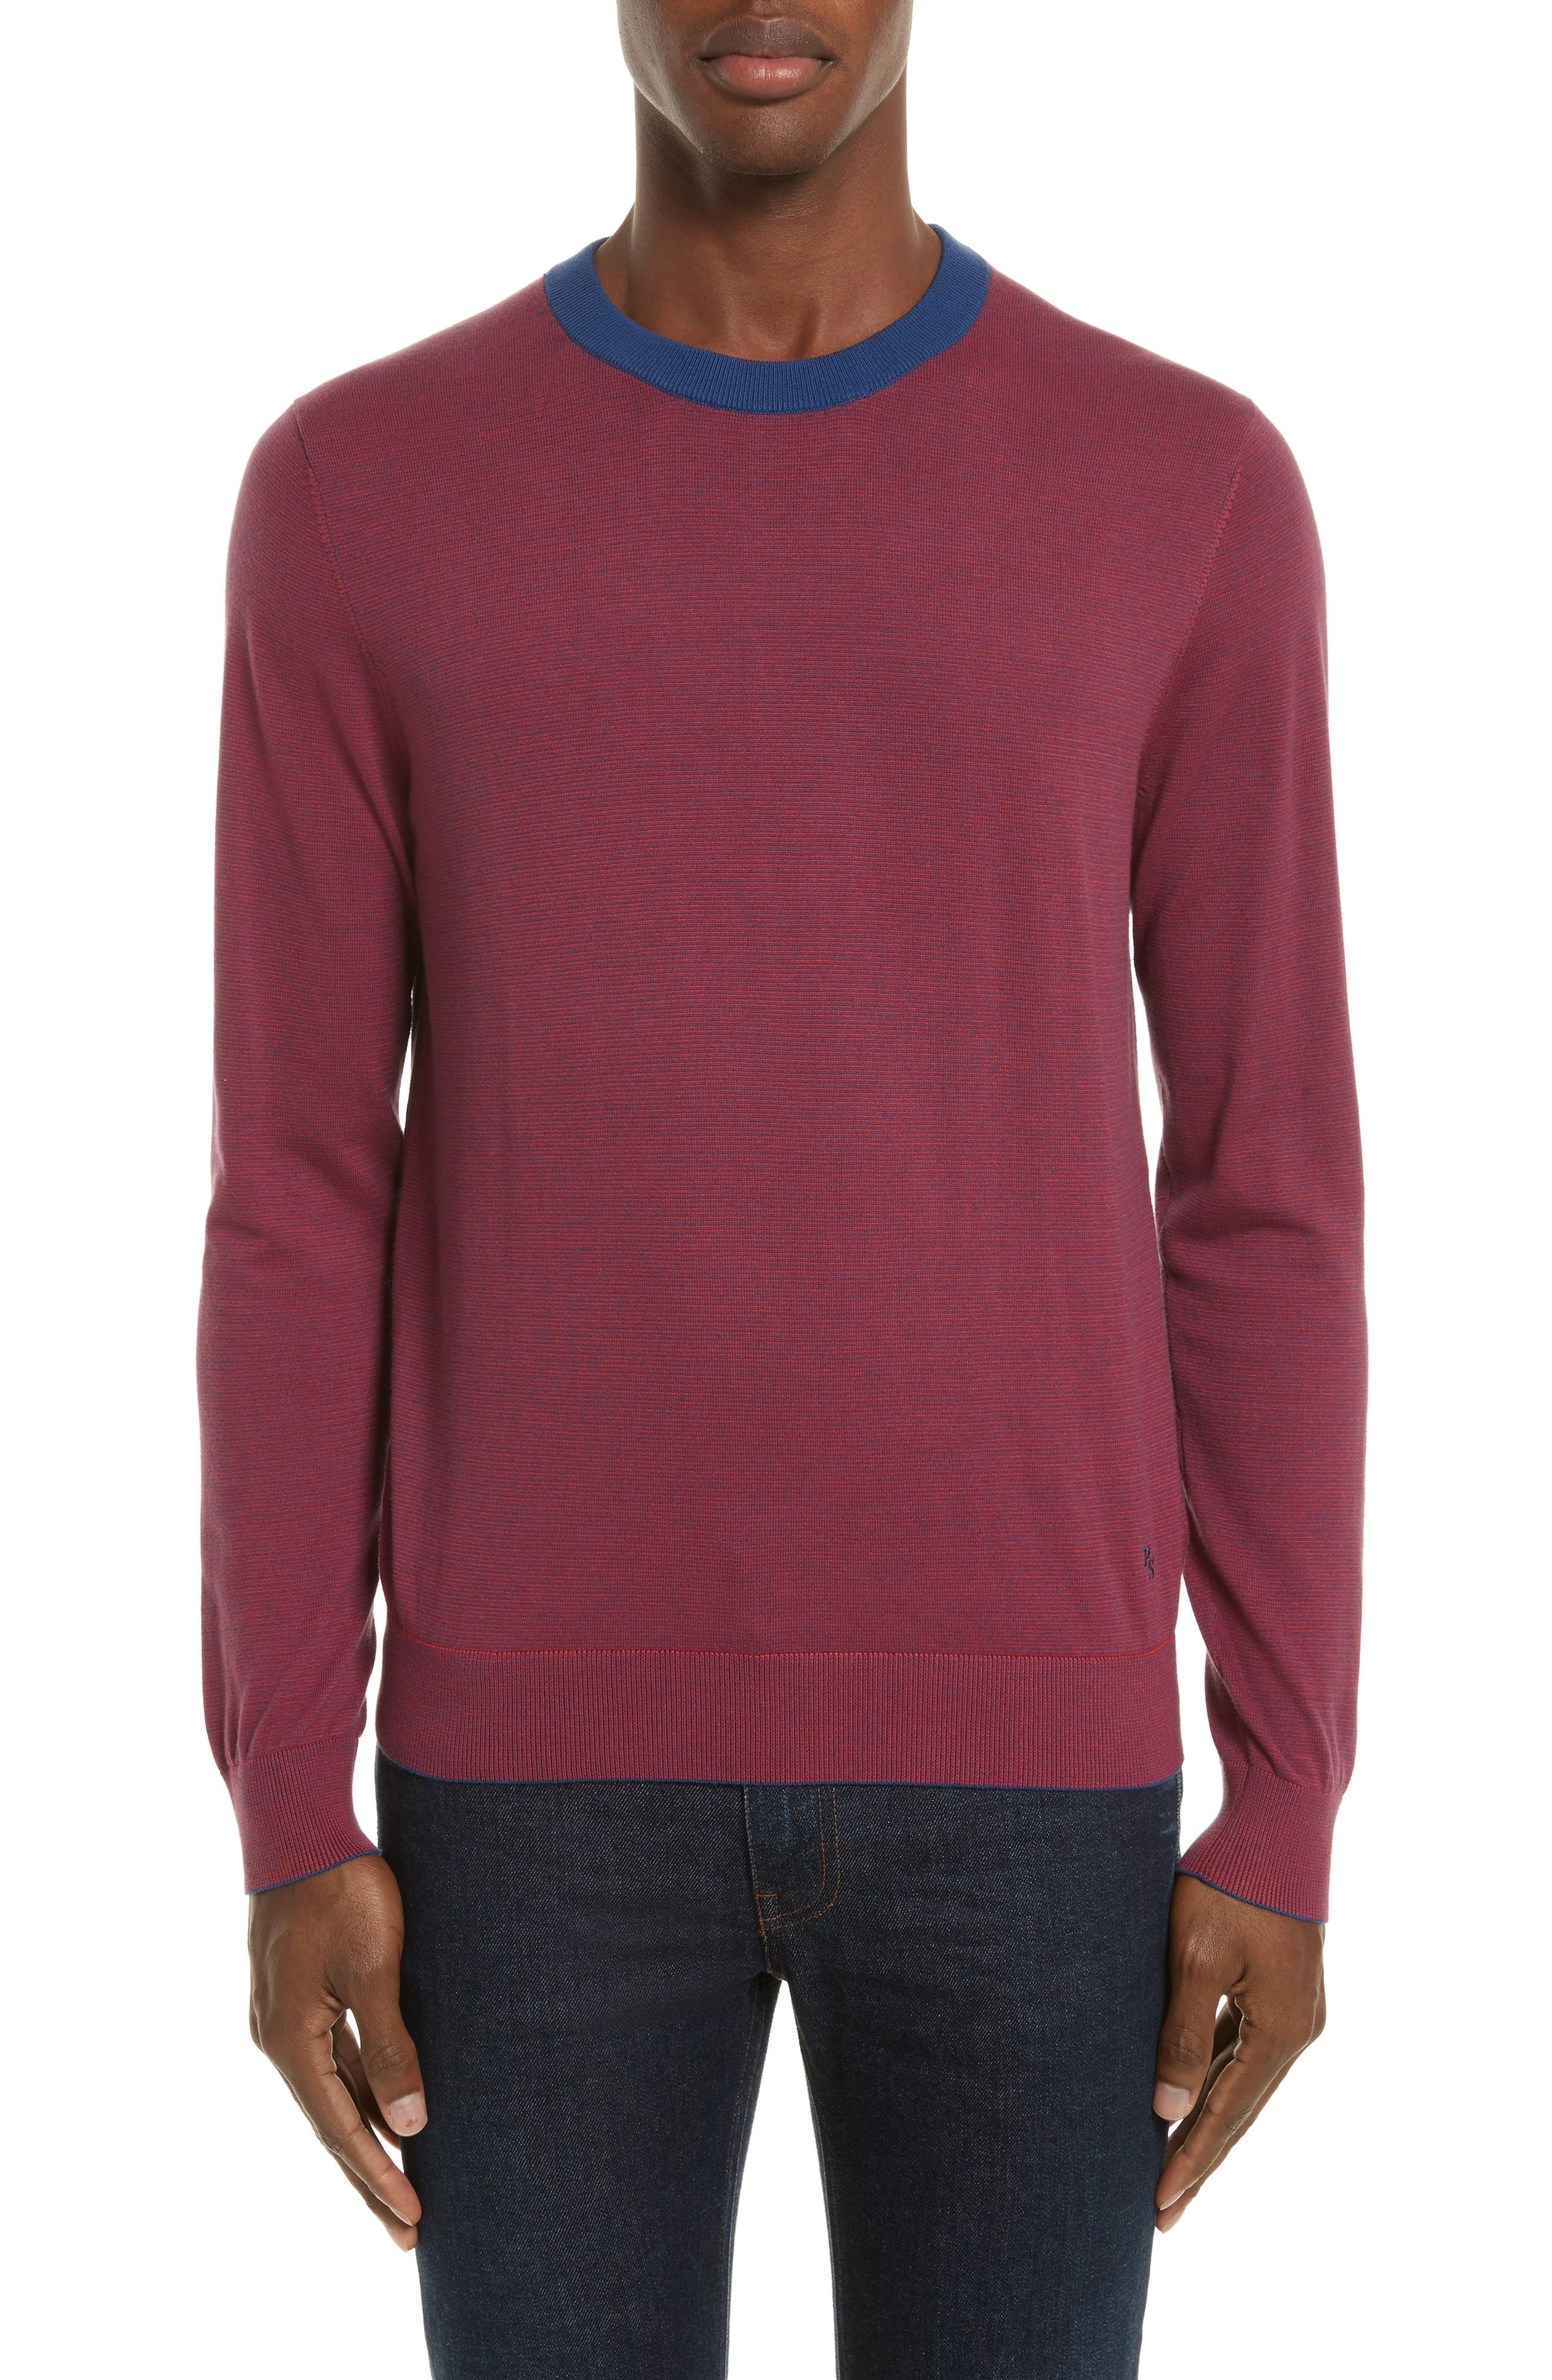 Ministripe Crewneck Sweater,                         Main,                         color, Red